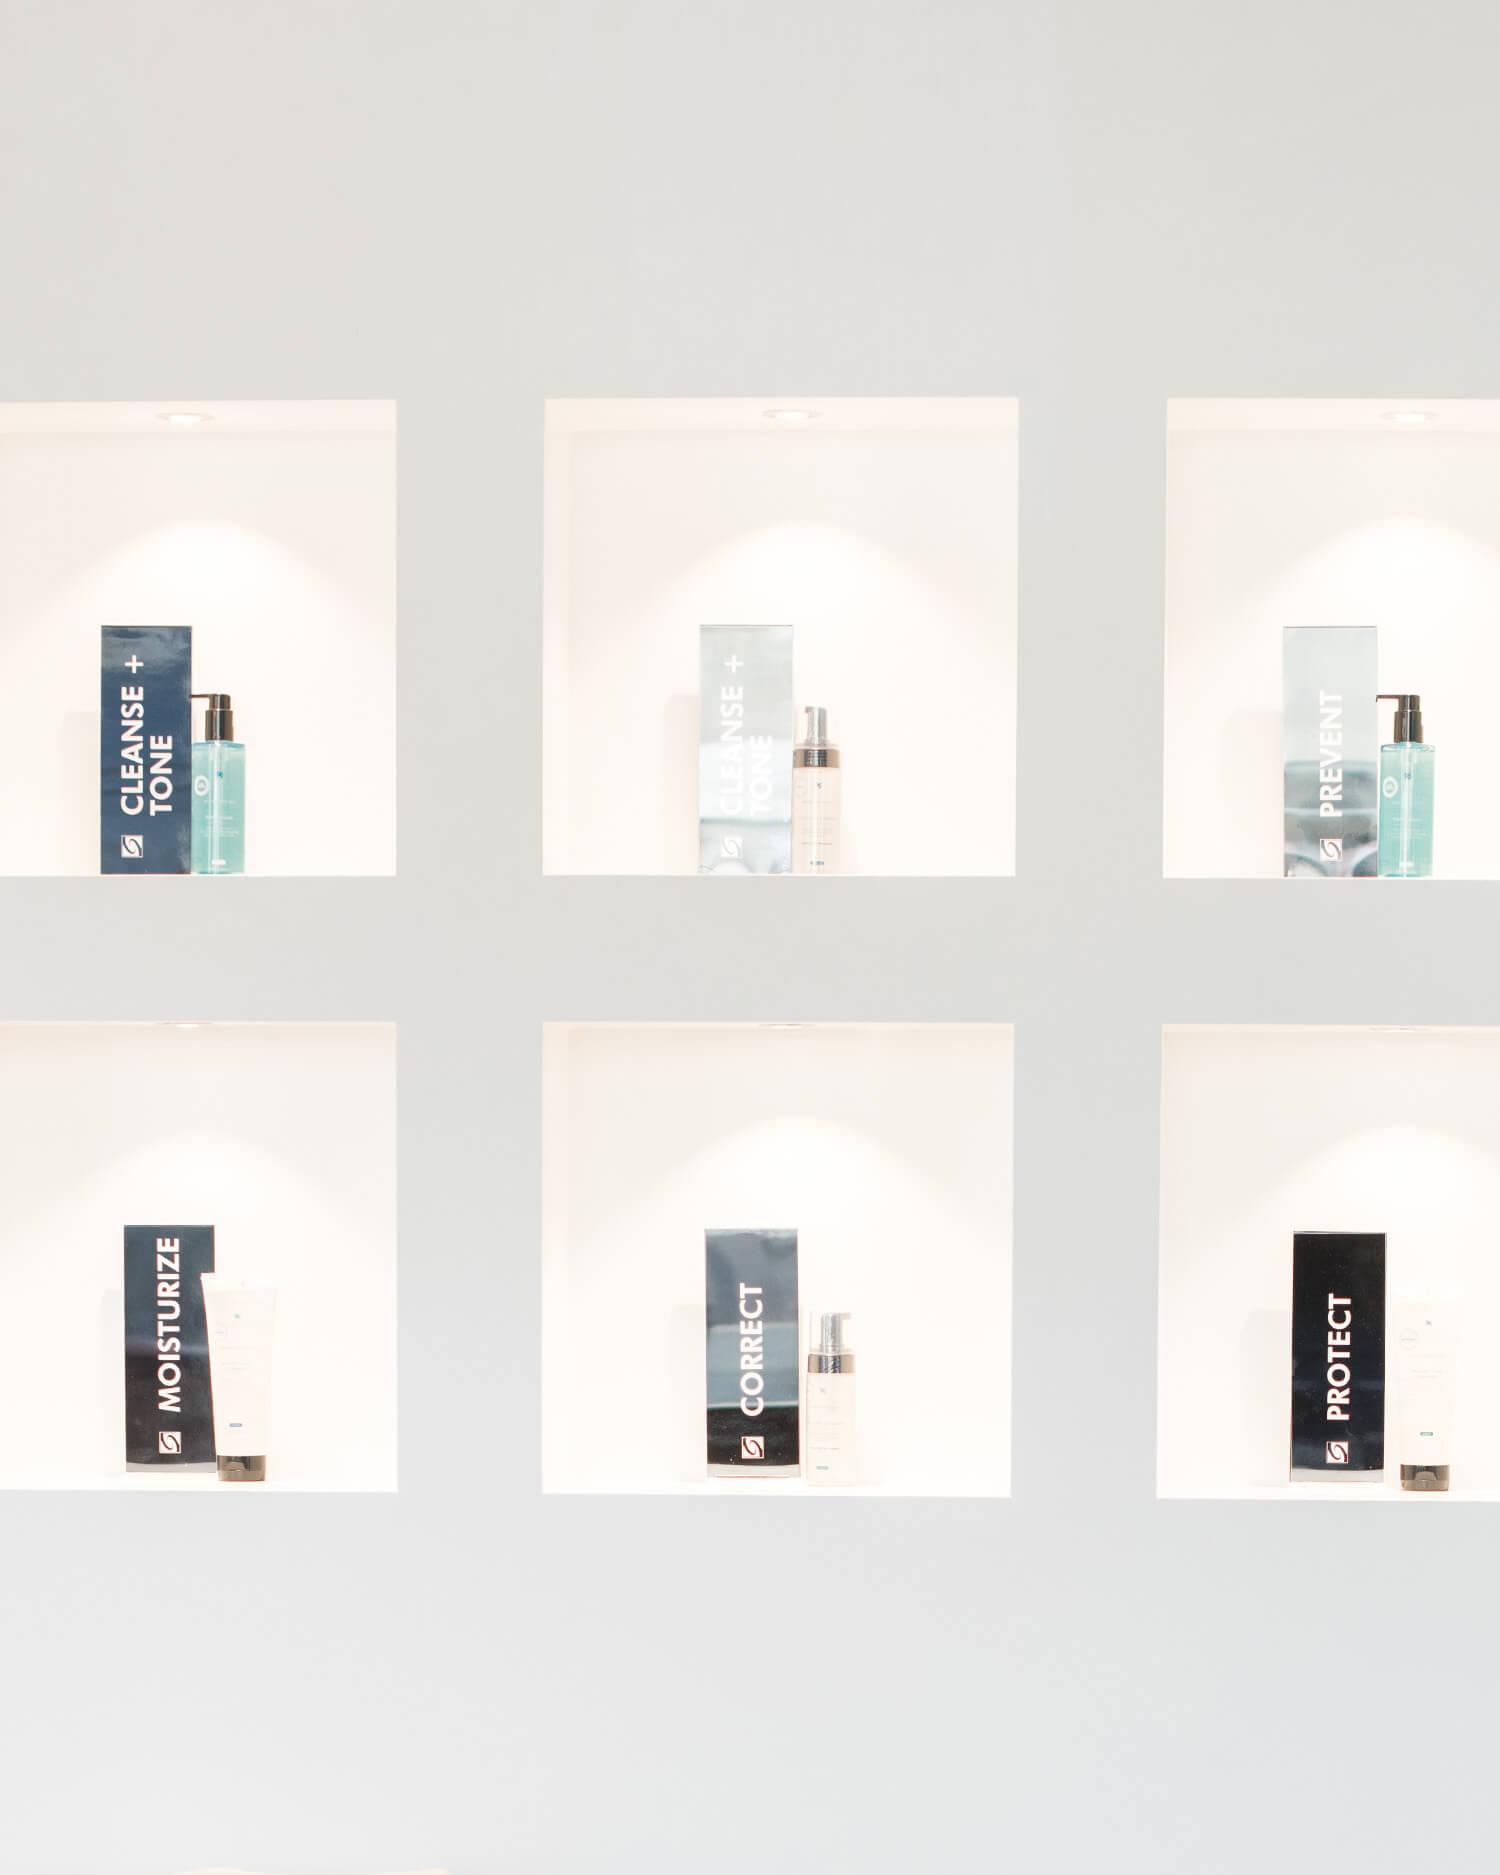 Brands-Madreperla